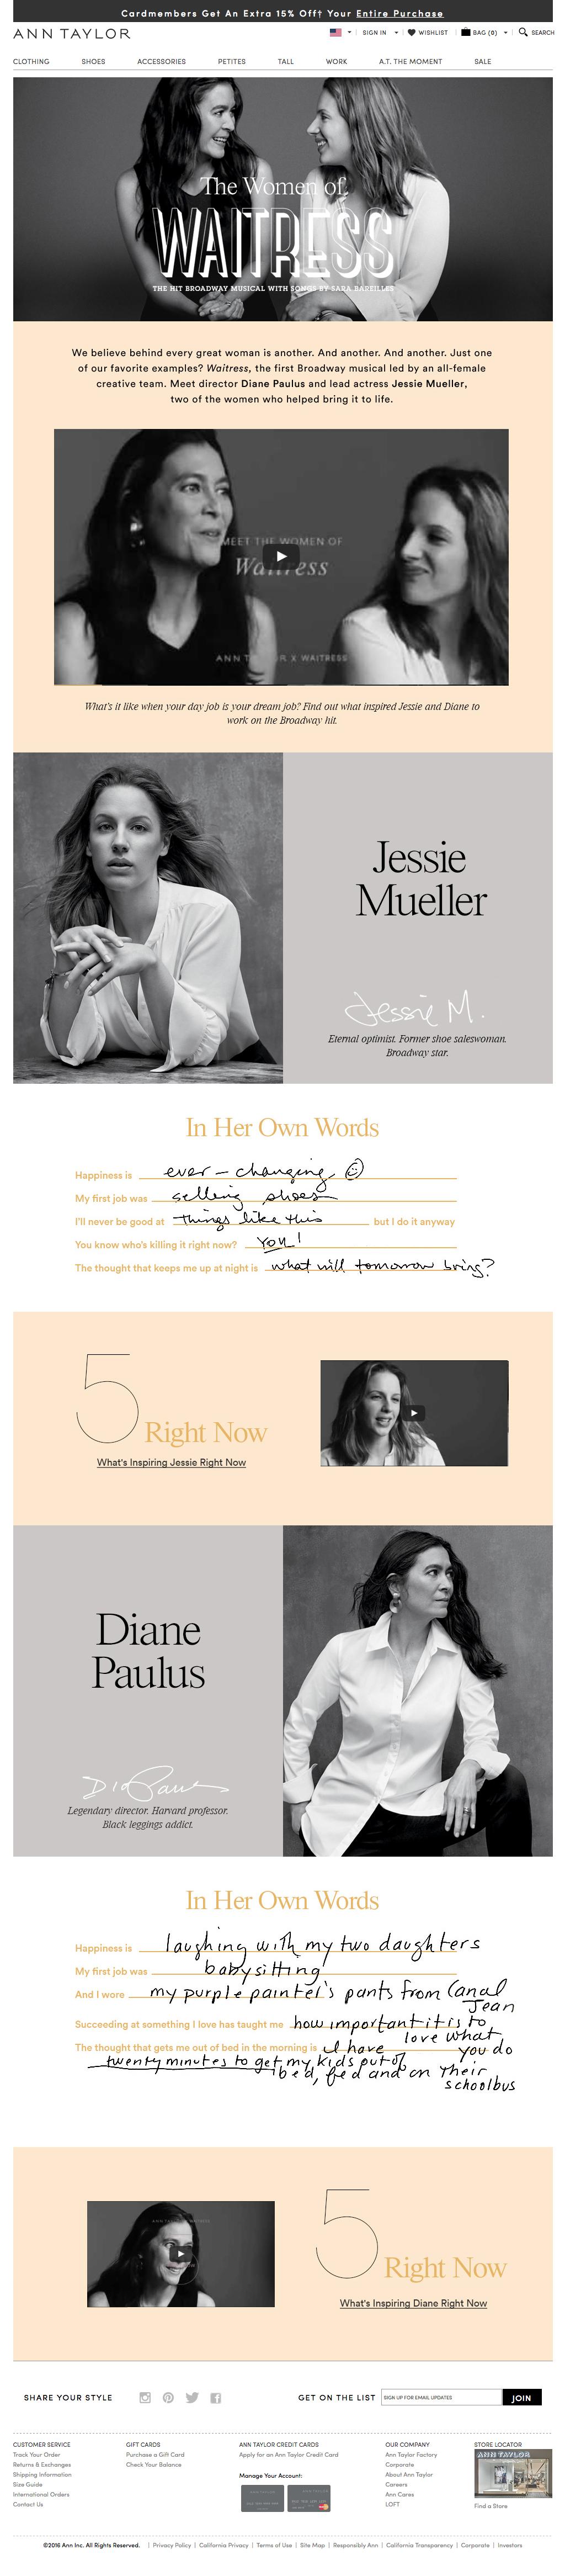 Retail,Fashion ,apparel,waitress,broadway,women,inspiration,inspiring,campaign